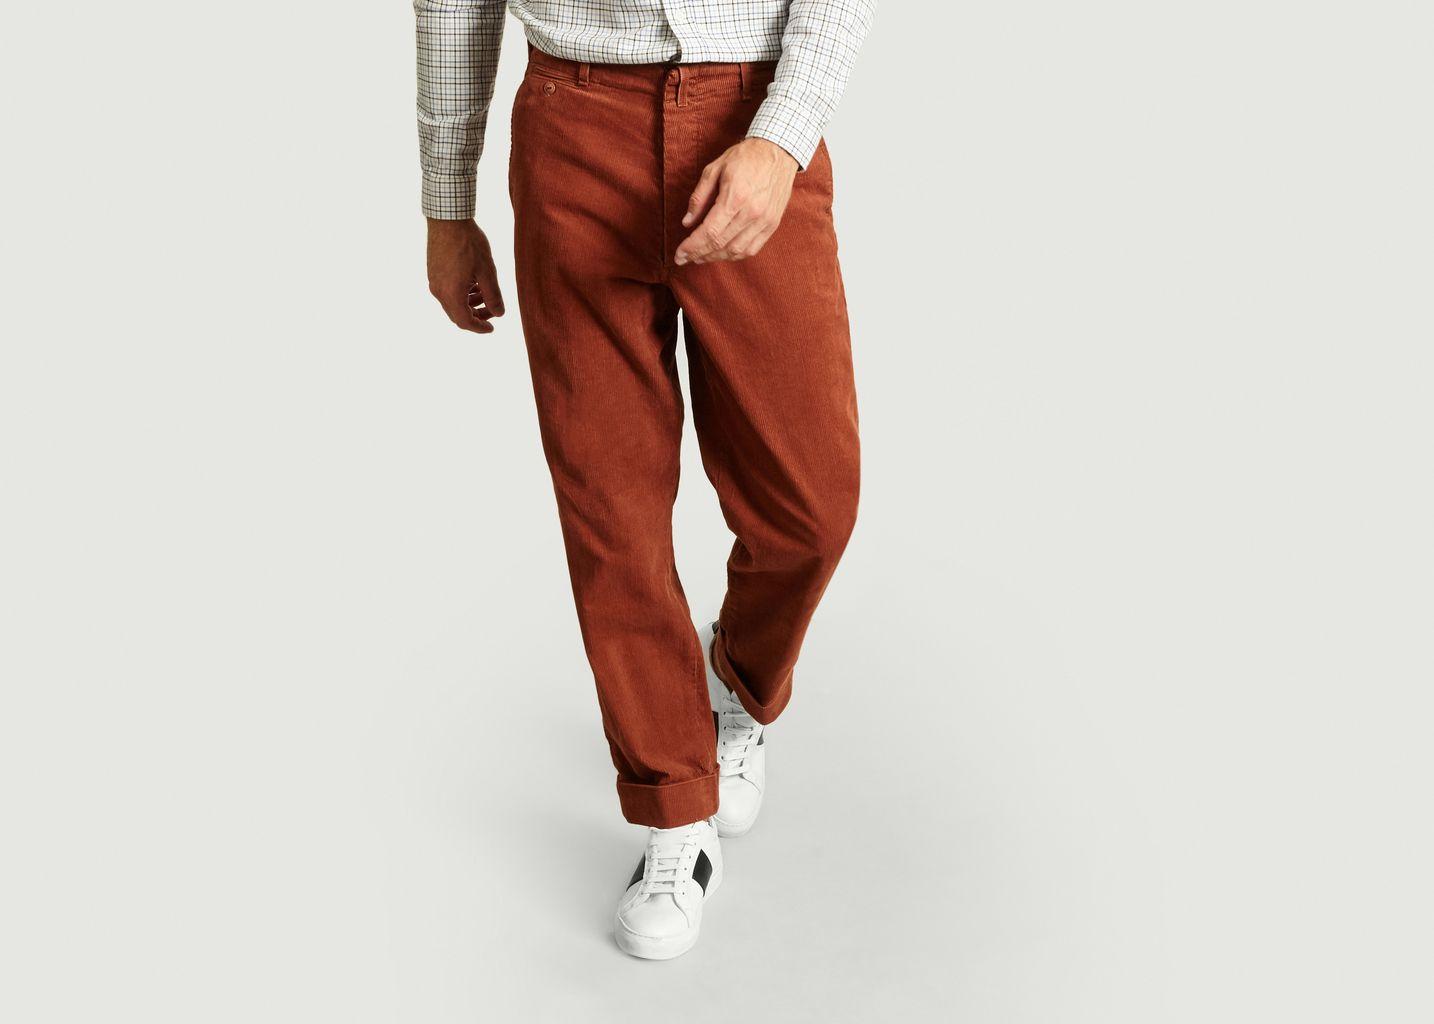 Pantalon Uni En Velours - Levi's Vintage Clothing